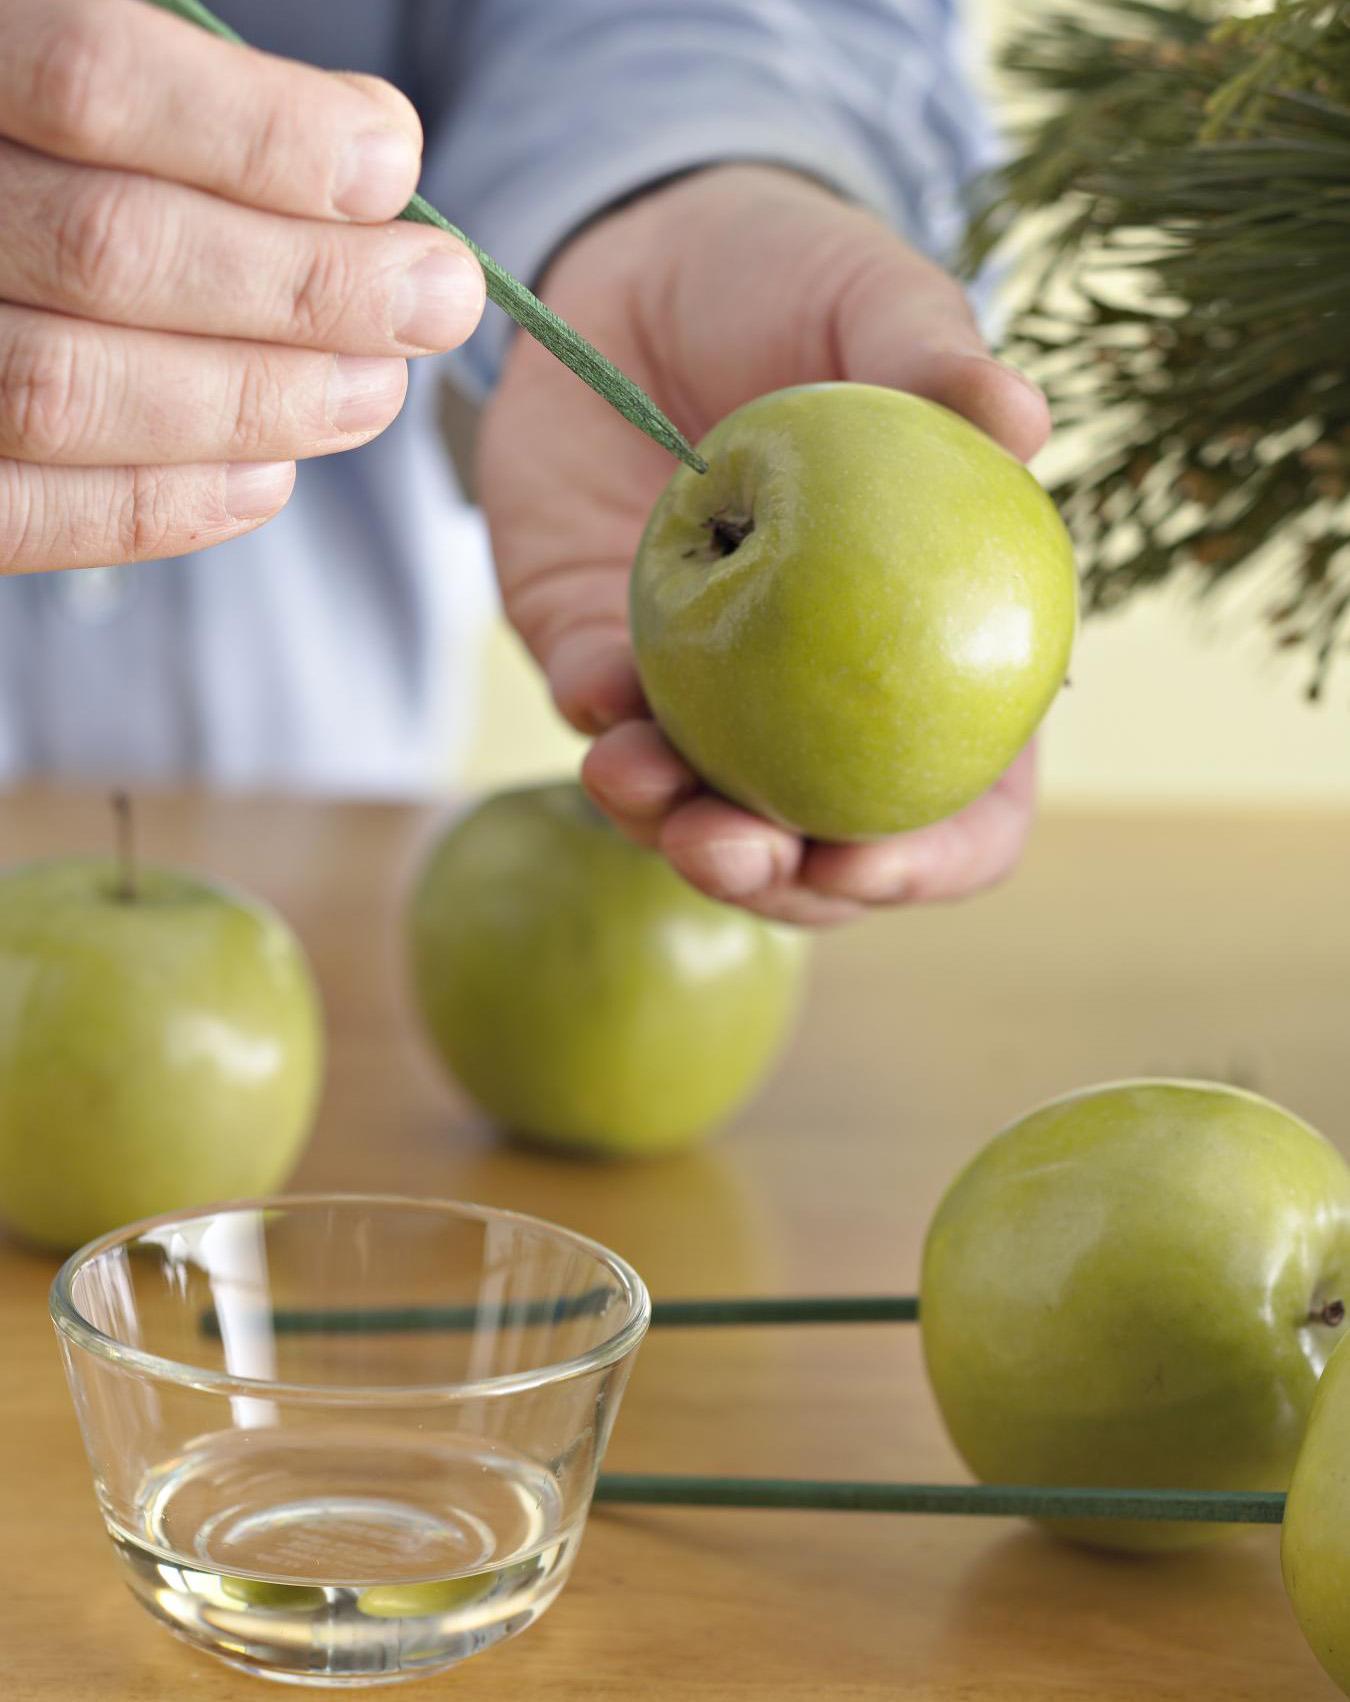 Step 3: Prep apples